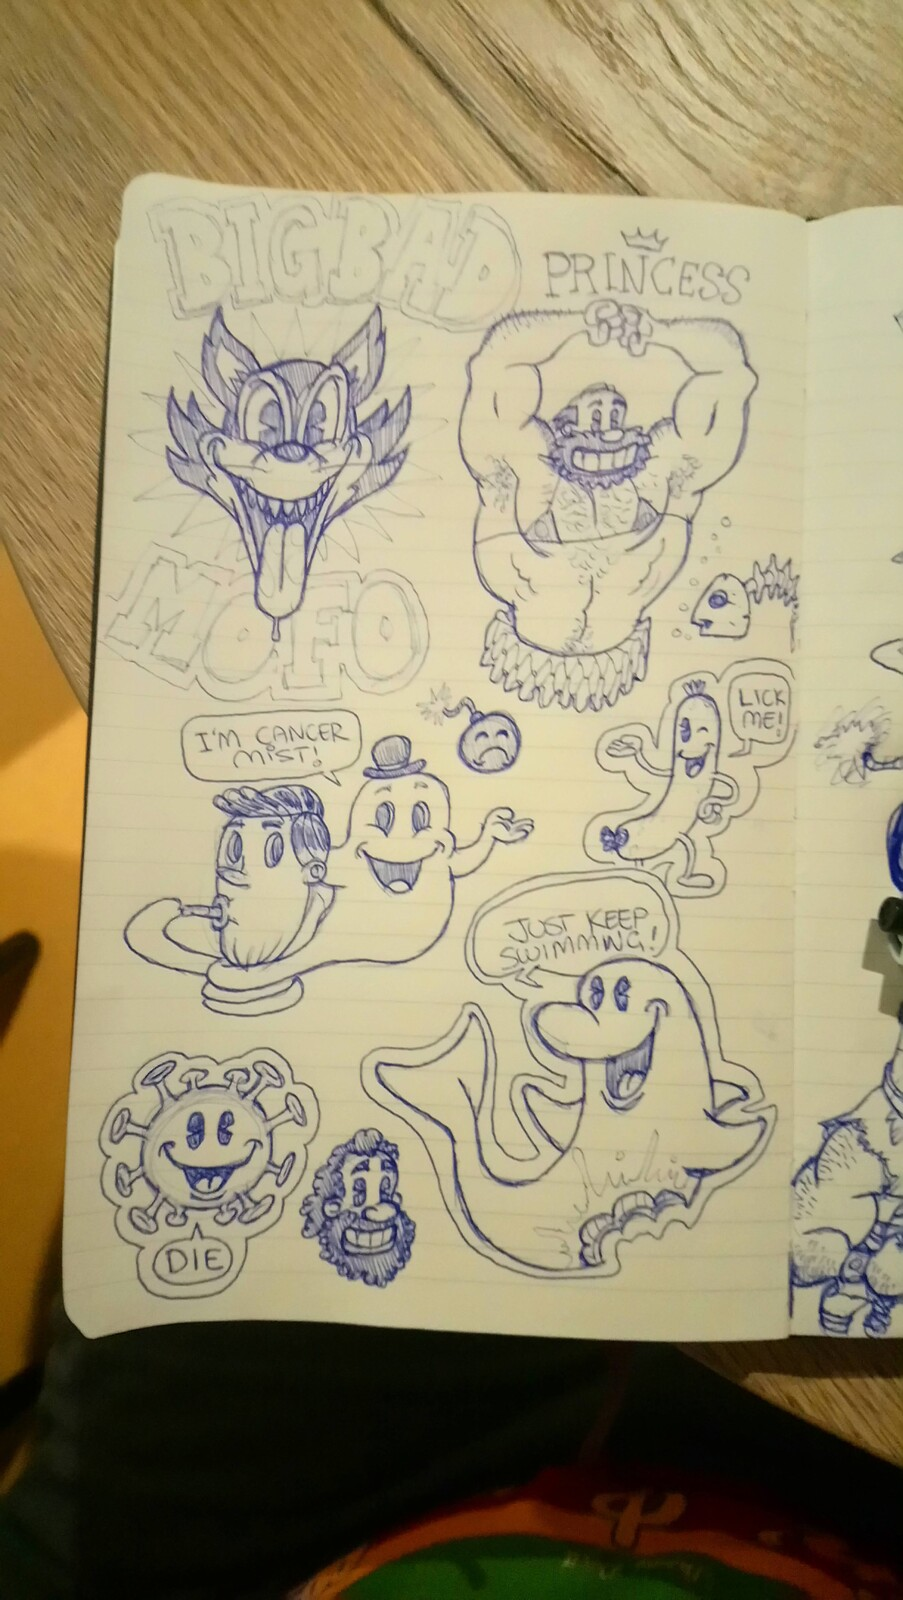 Initial sketch - doodles